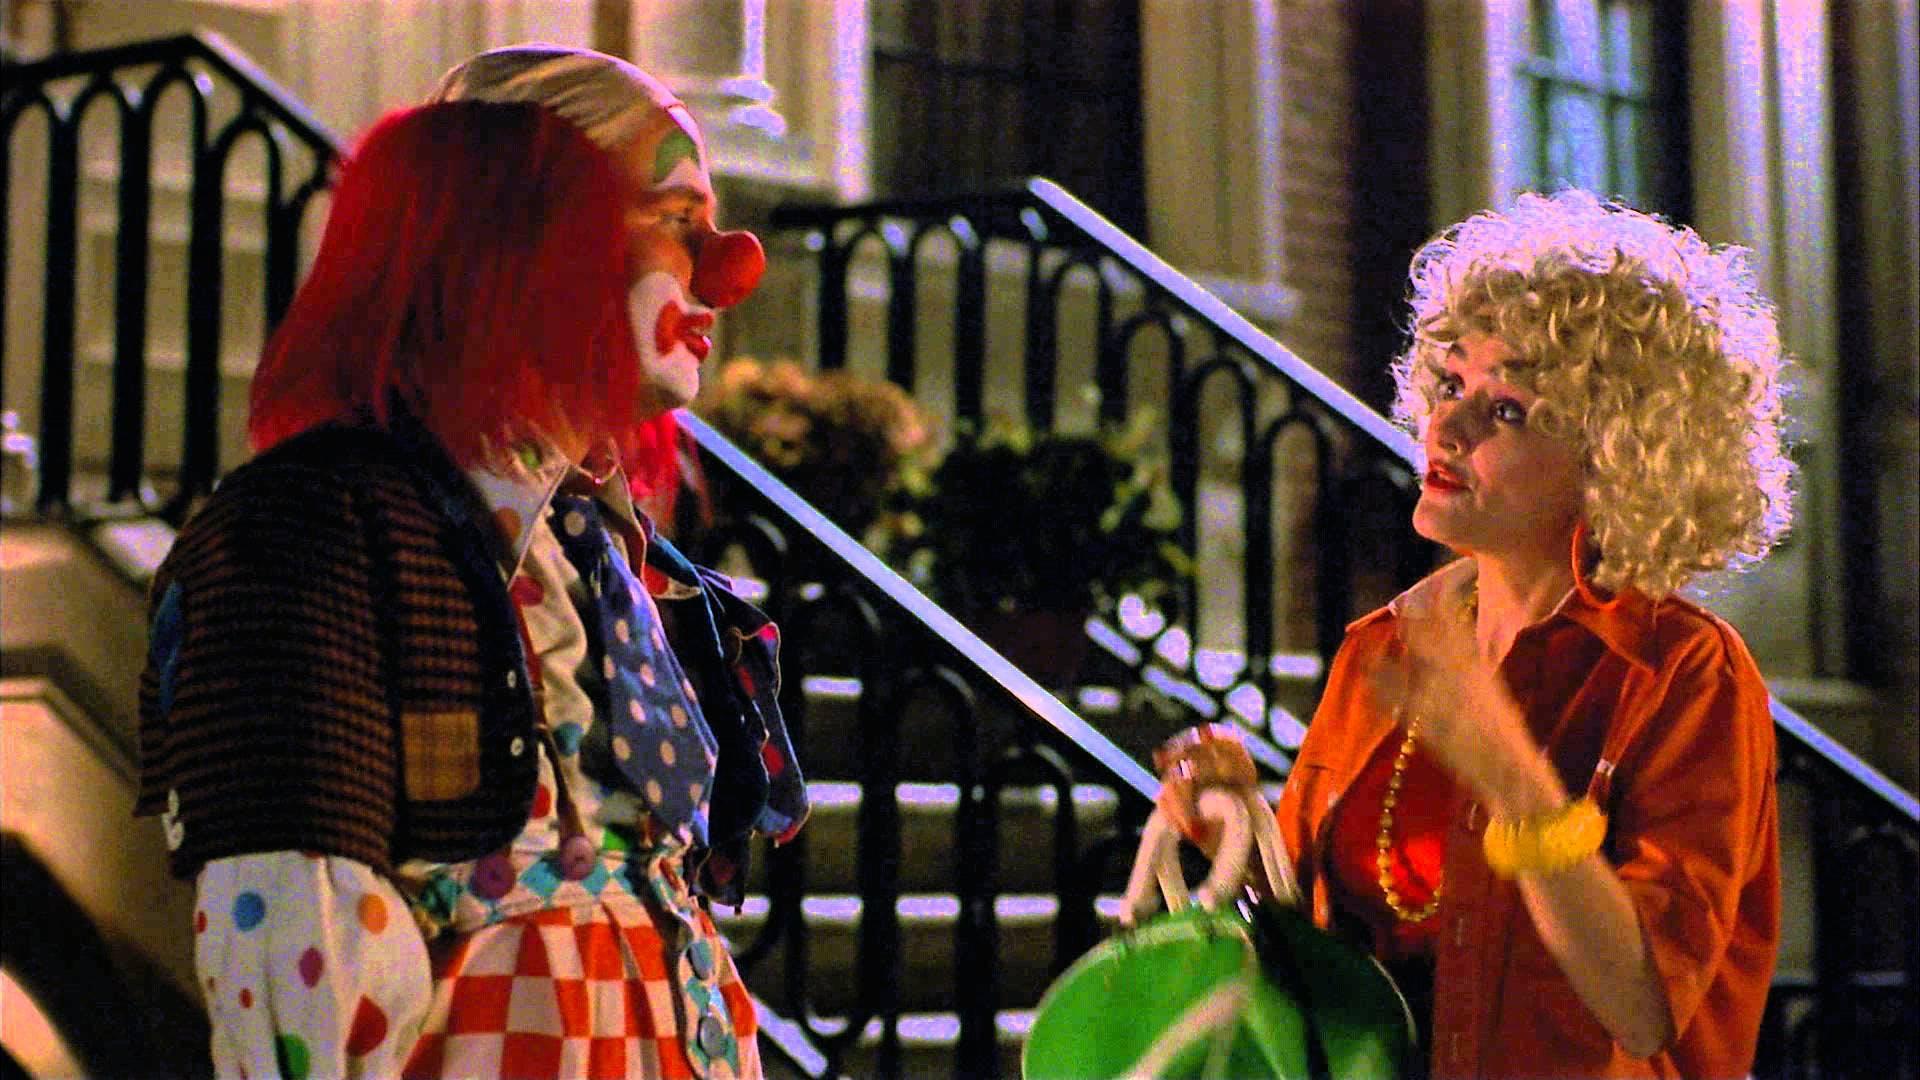 adam sandler movies : Shakes the Clown